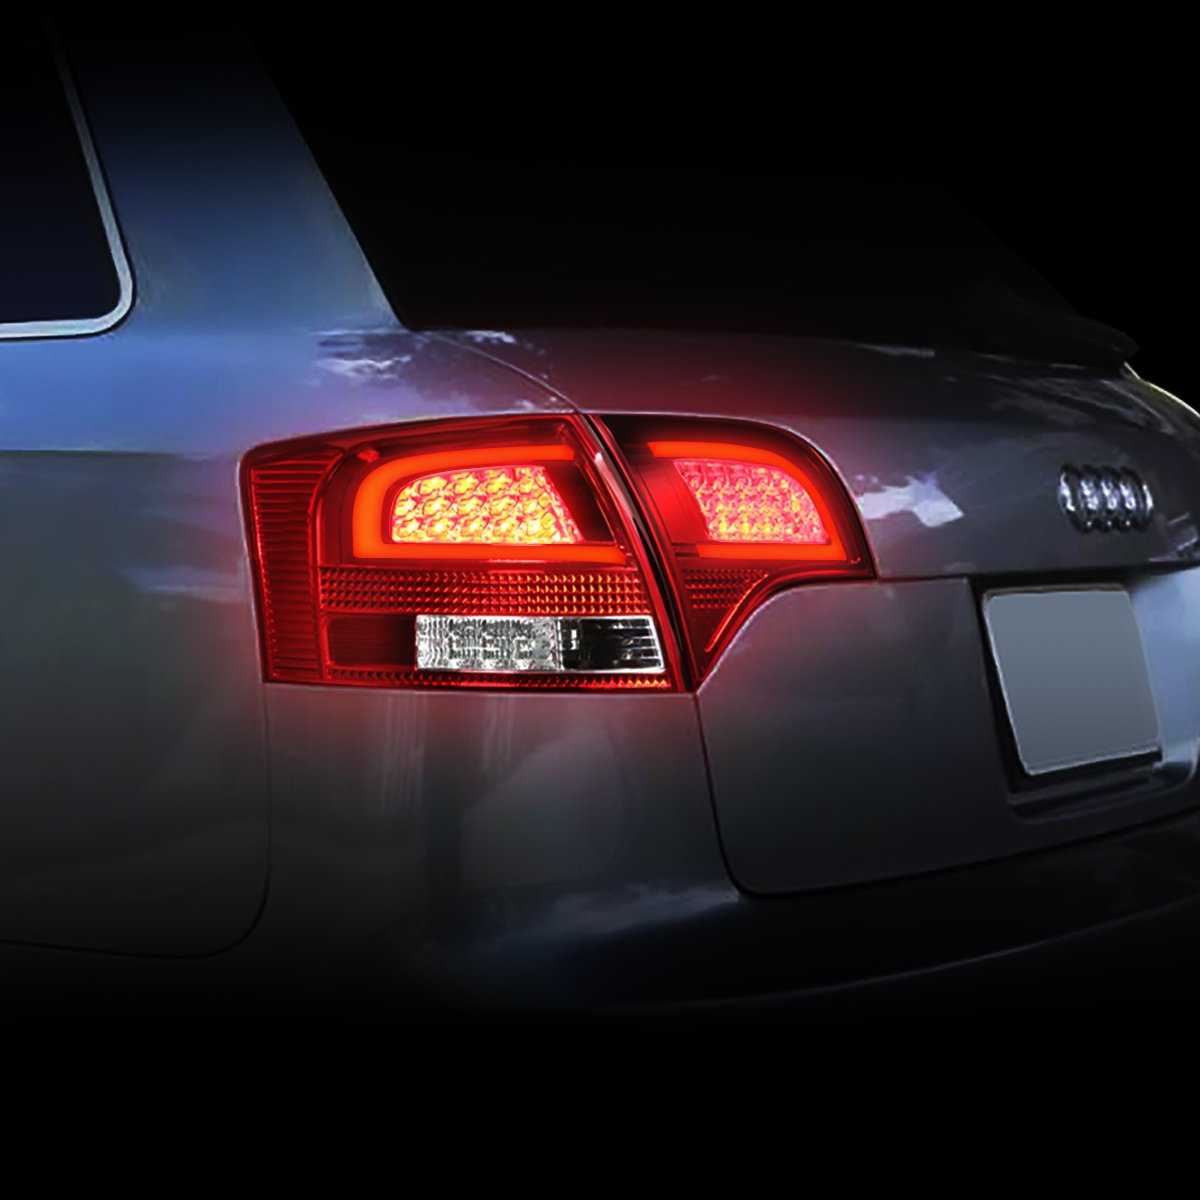 DNA Motoring TL-LED-3D-A405-CR 3D LED Tail Light Driver /& Passenger Side